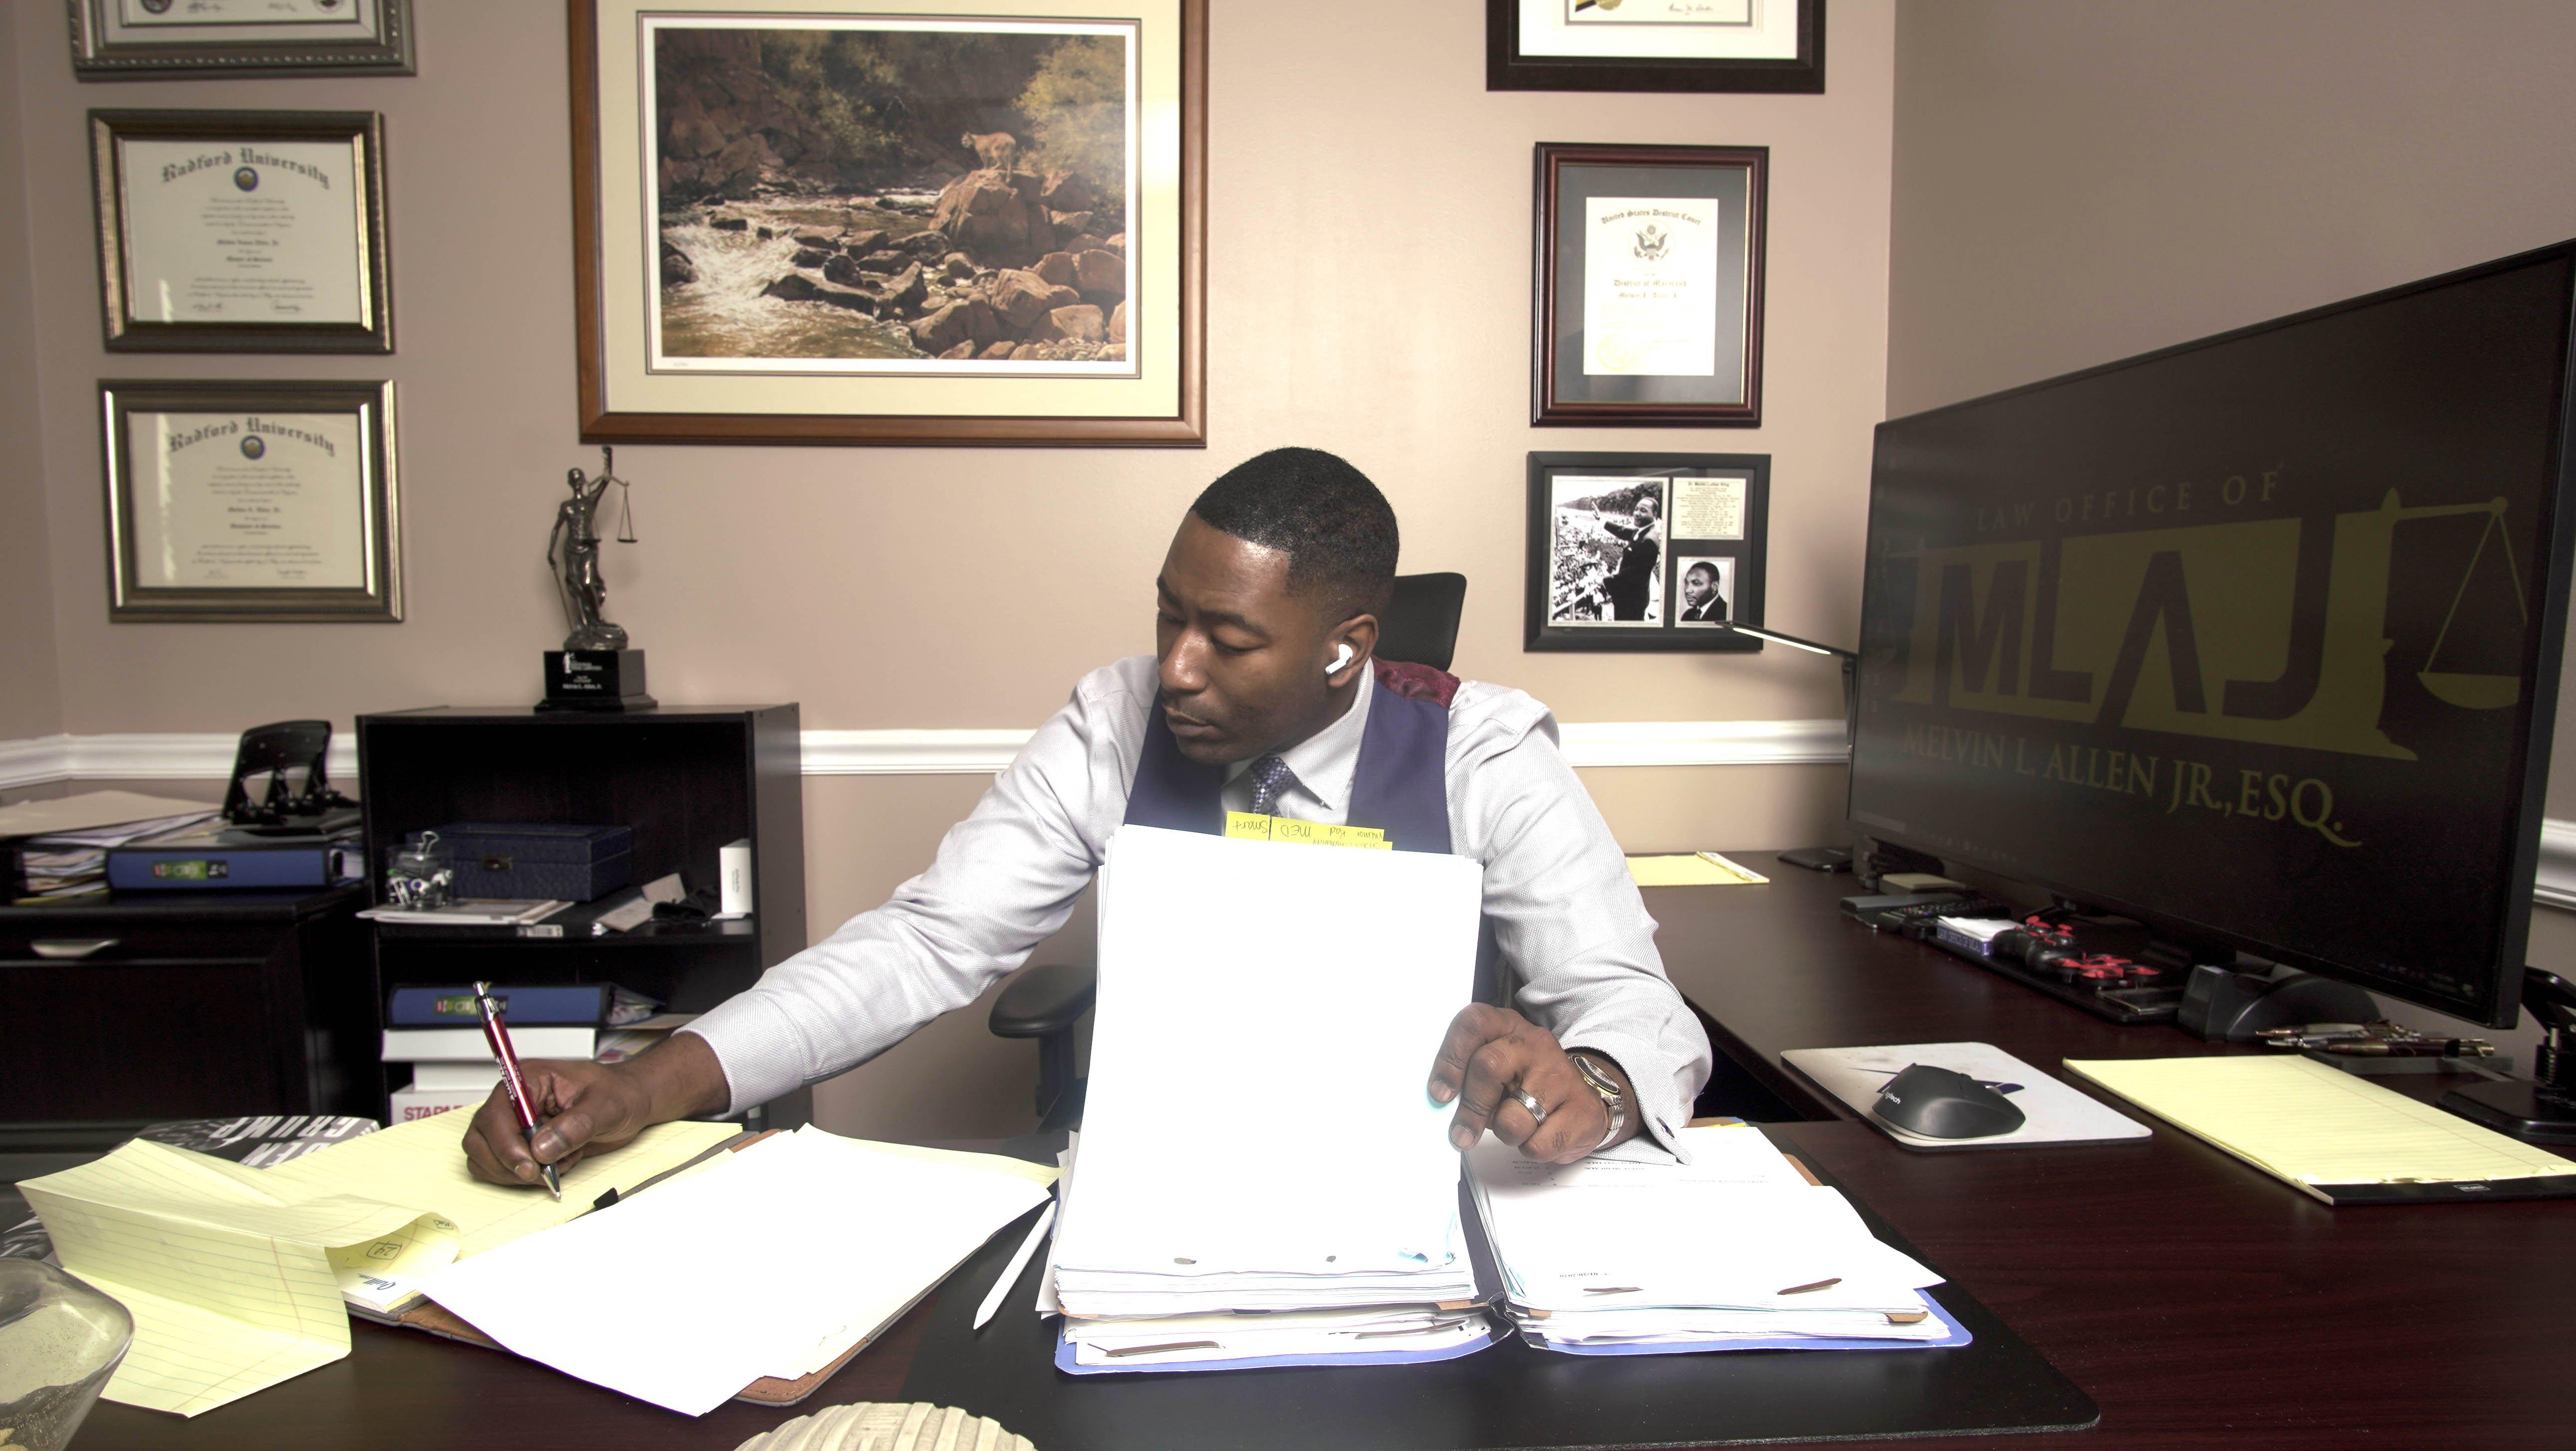 Melvin Allen Jr. working at his desk